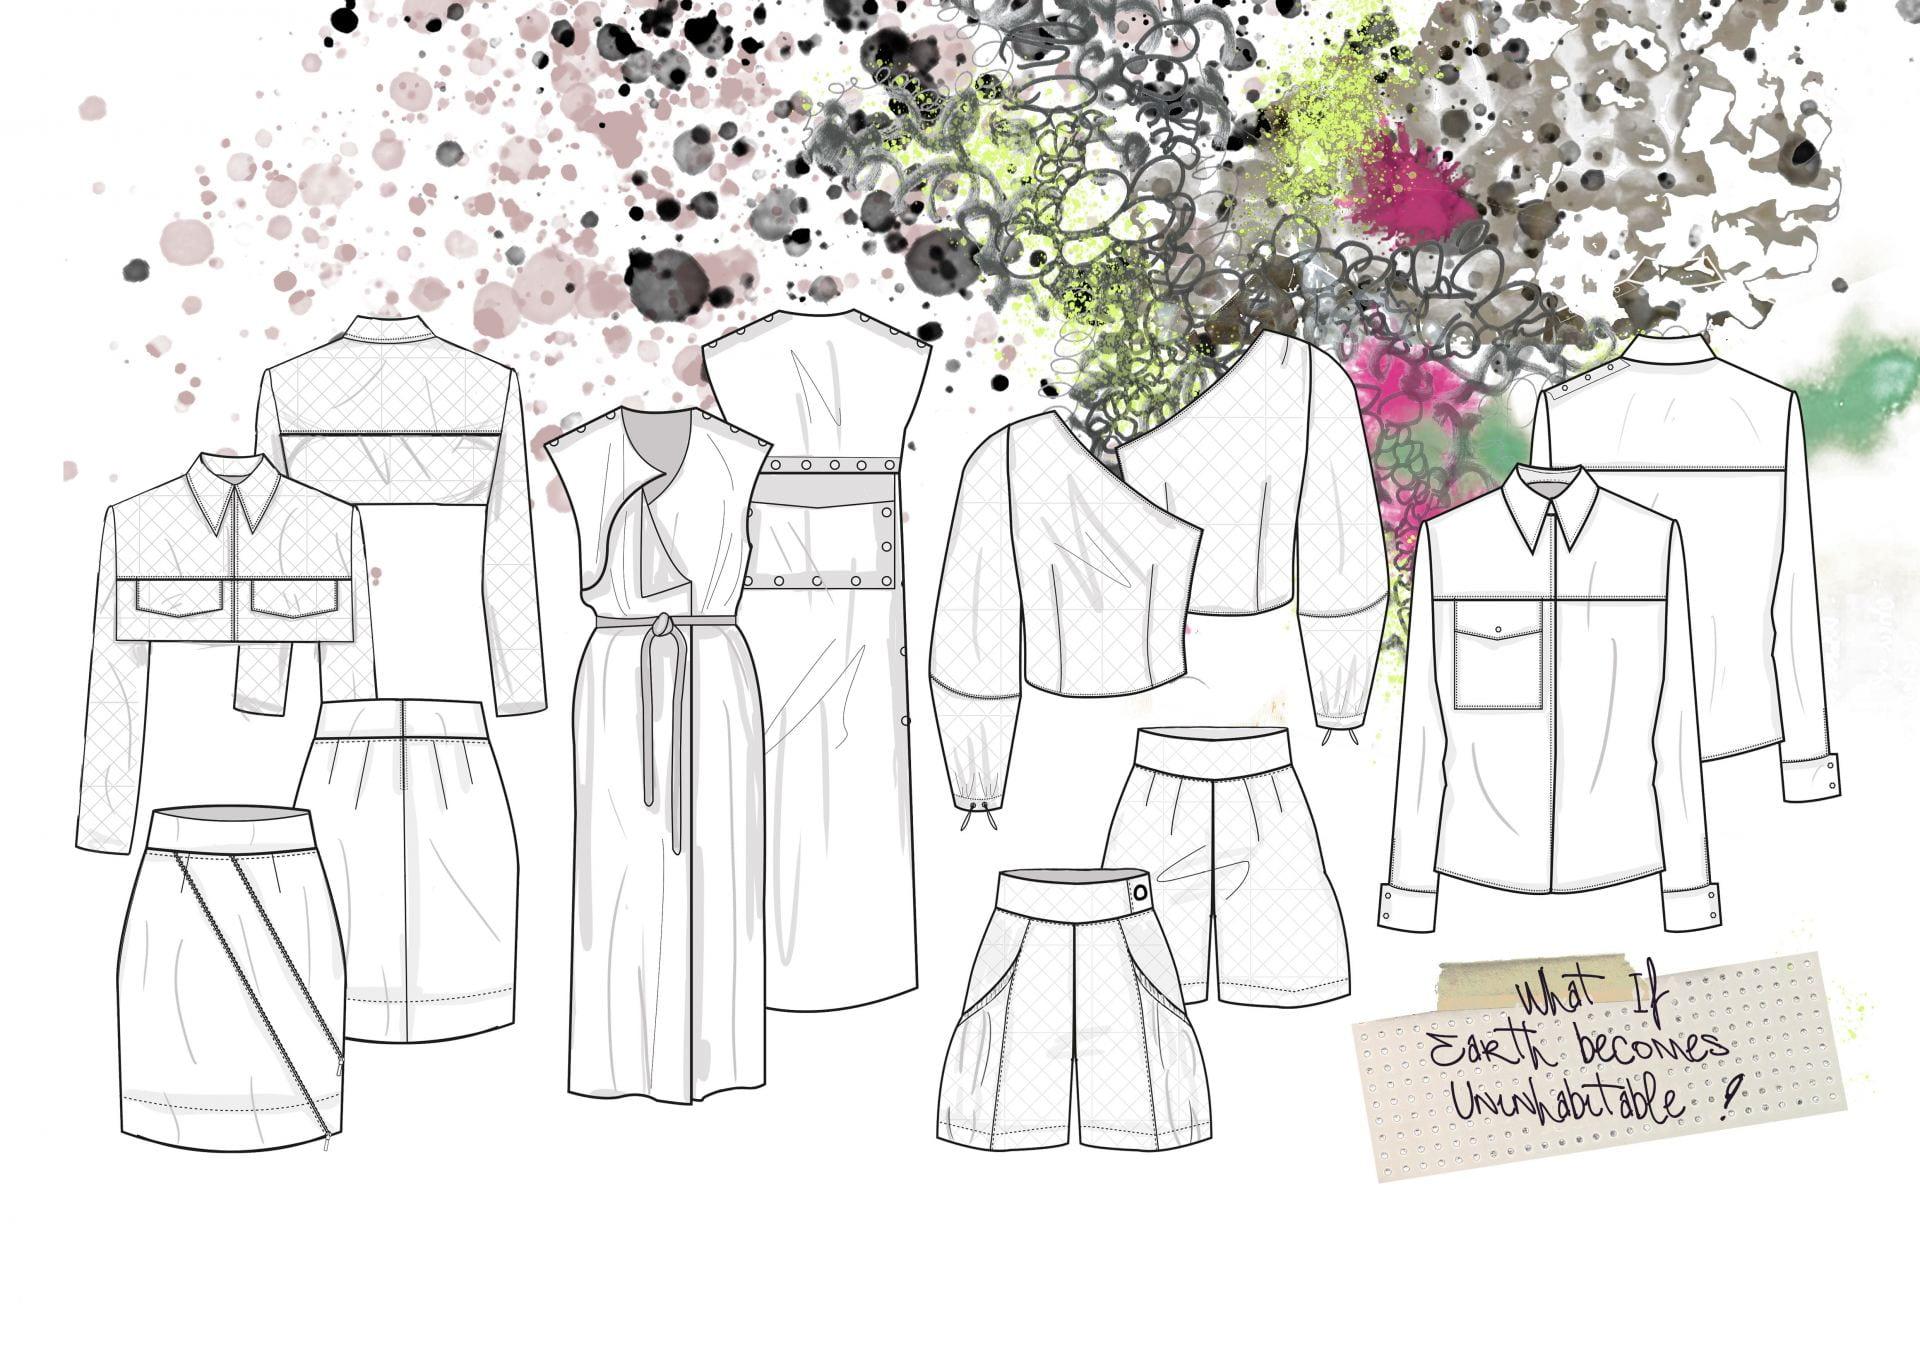 Series of garment designs.